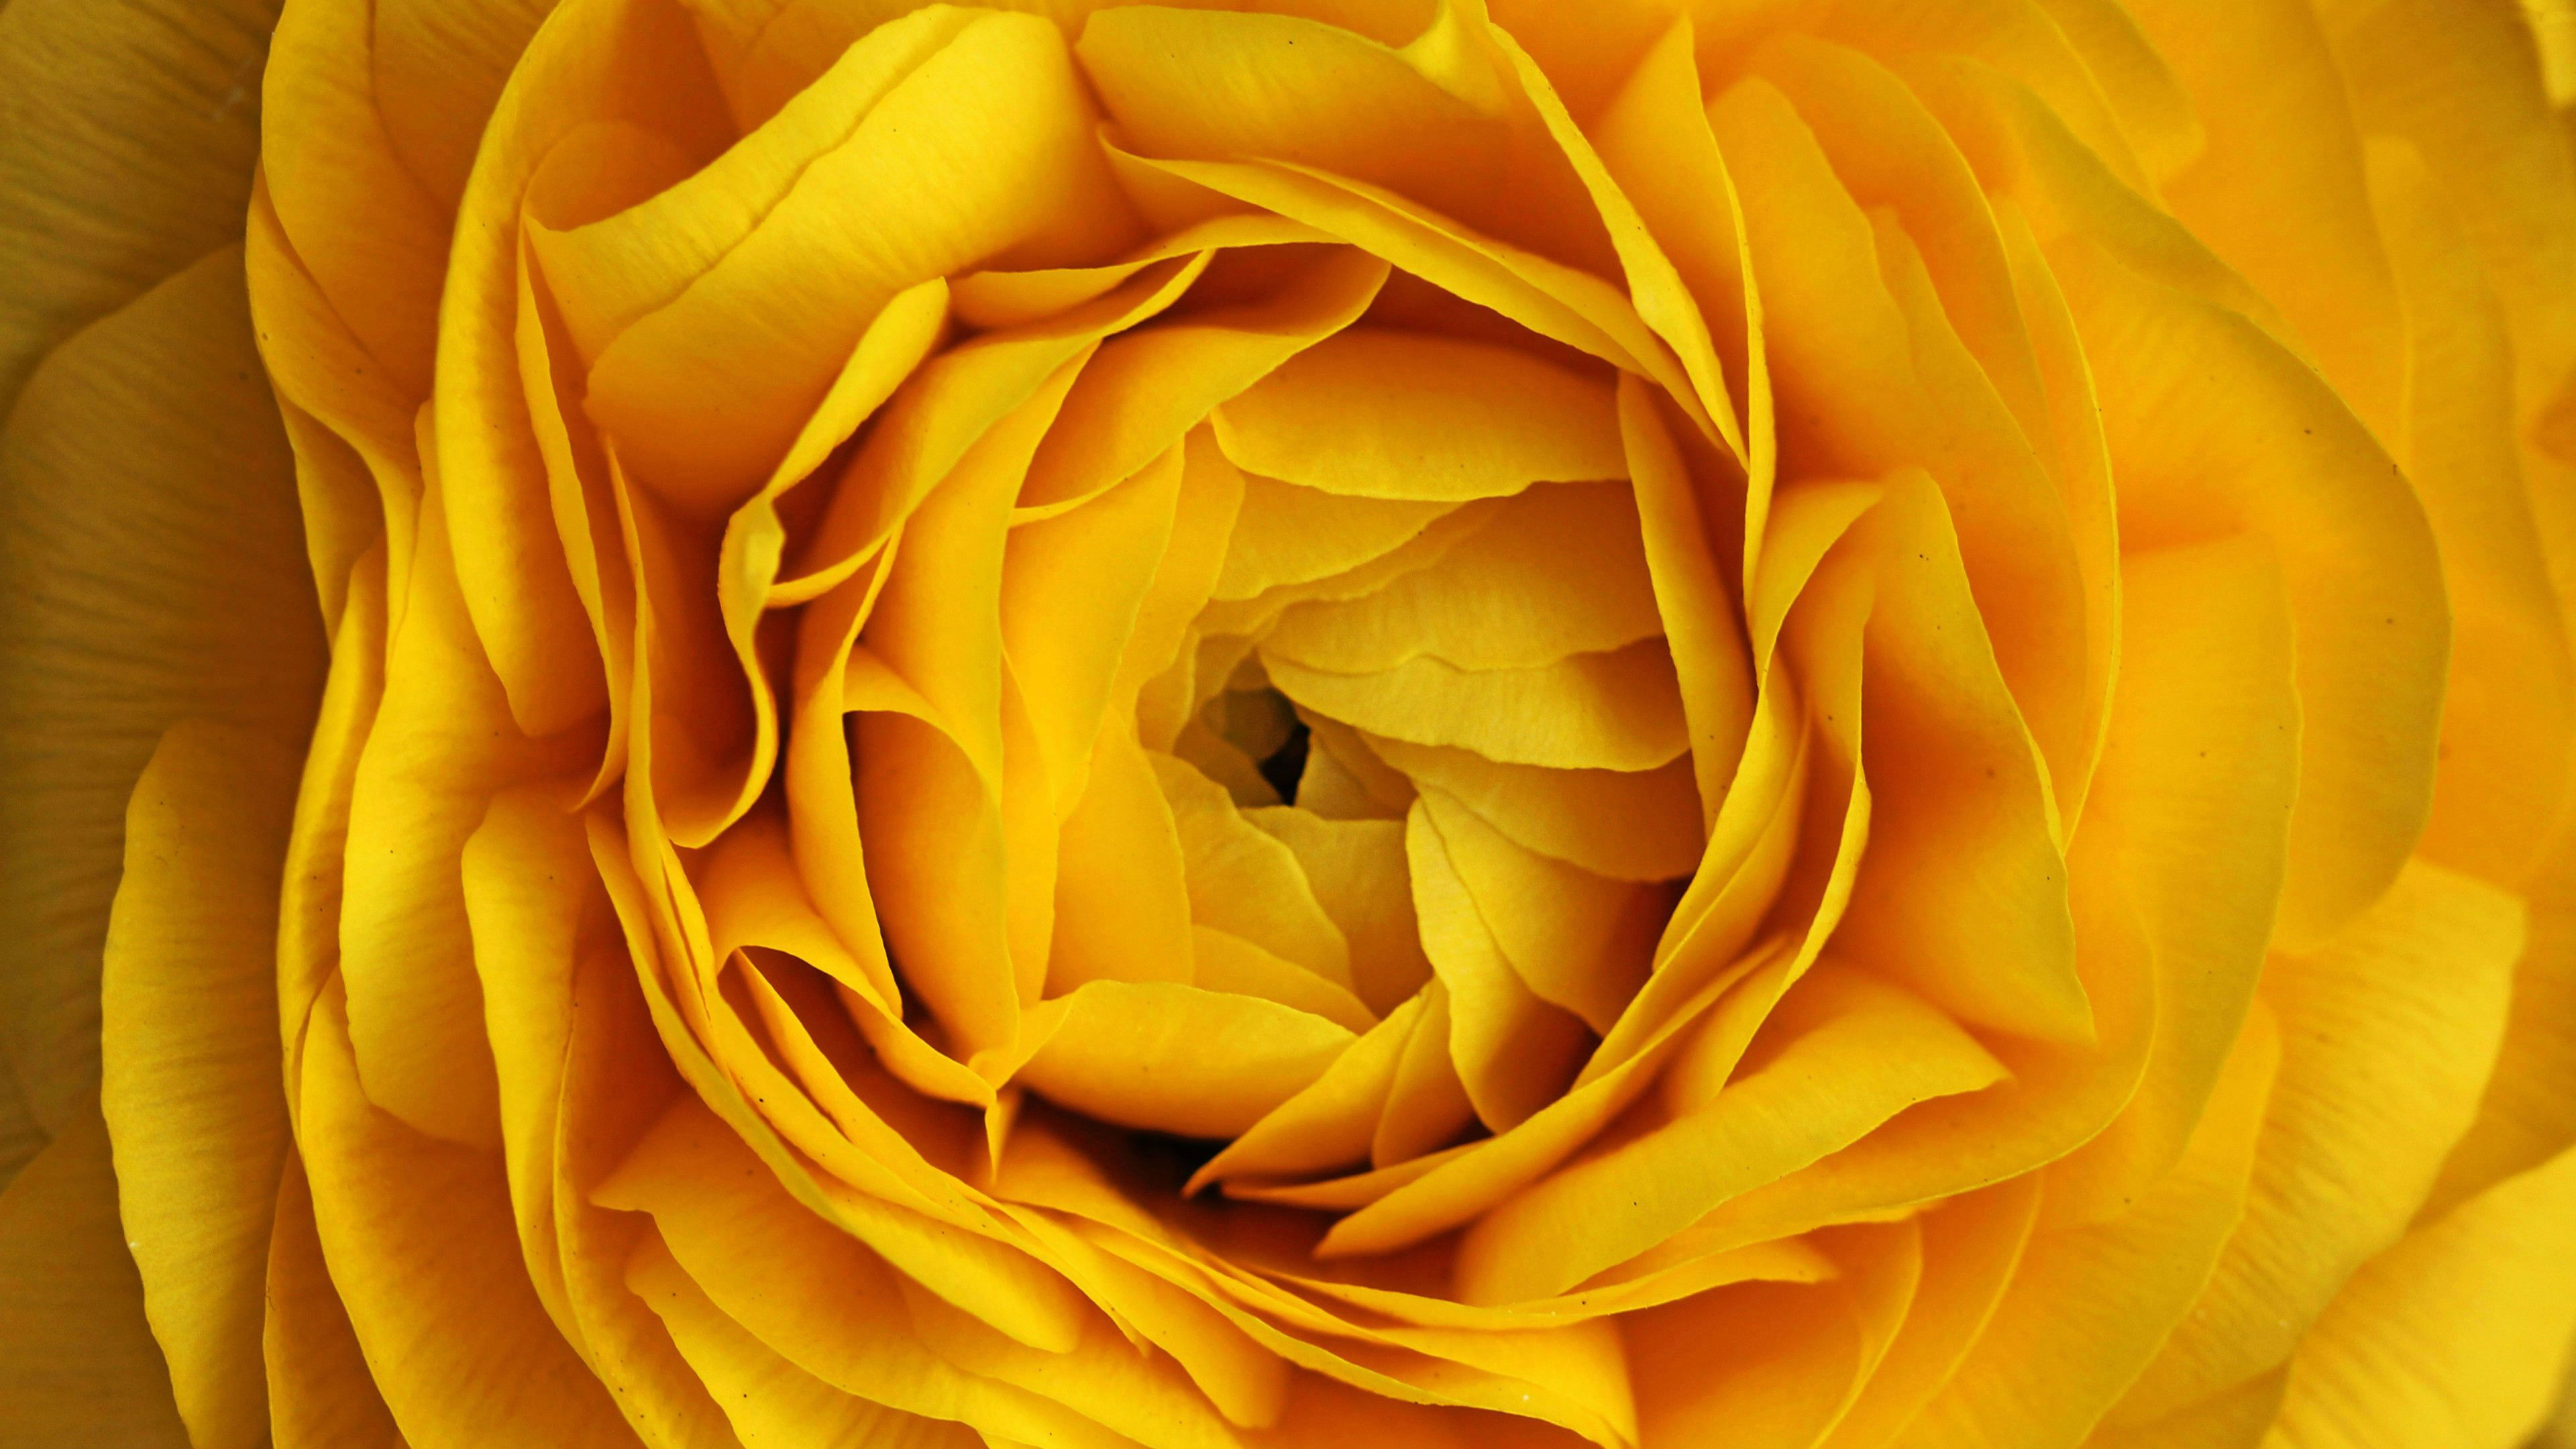 Ultra hd wallpaper flower 4k yellow rose flower hd wallpapers ultra hd wallpaper flower 4k yellow rose flower hd wallpapers dhlflorist Image collections